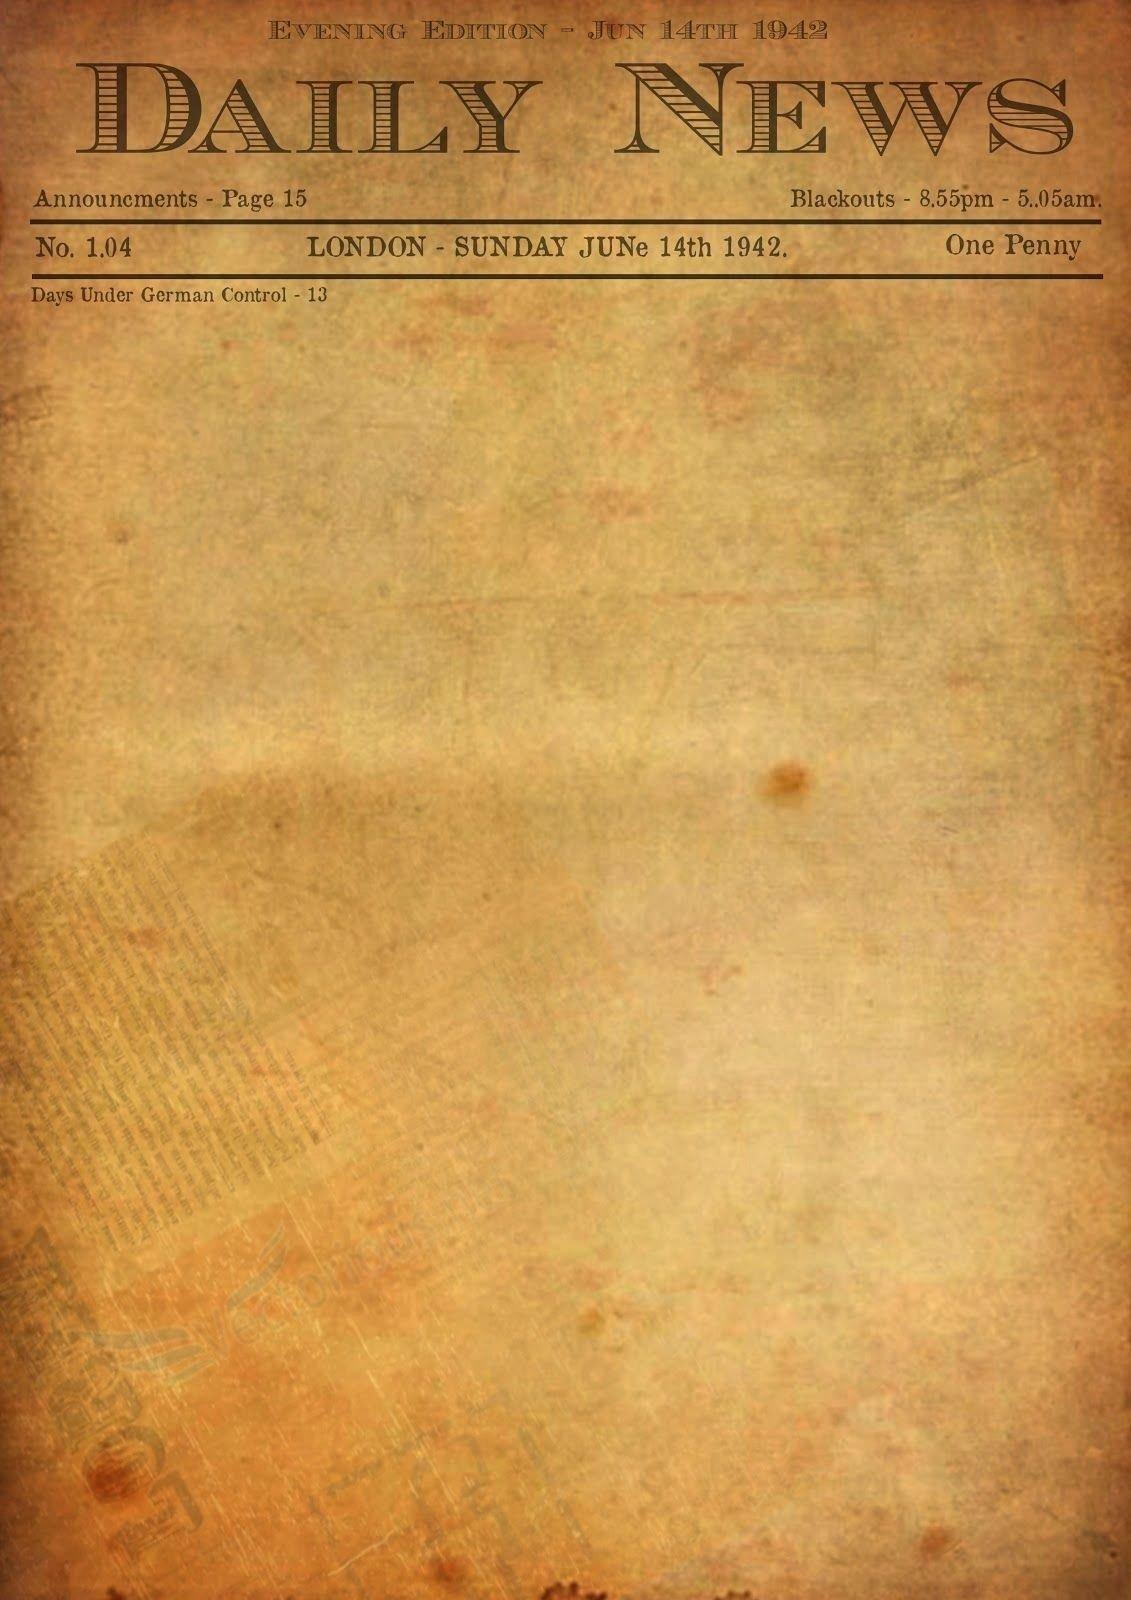 Editable Old Newspaper Template Luxury Best S Old Newspaper Template Editable Old